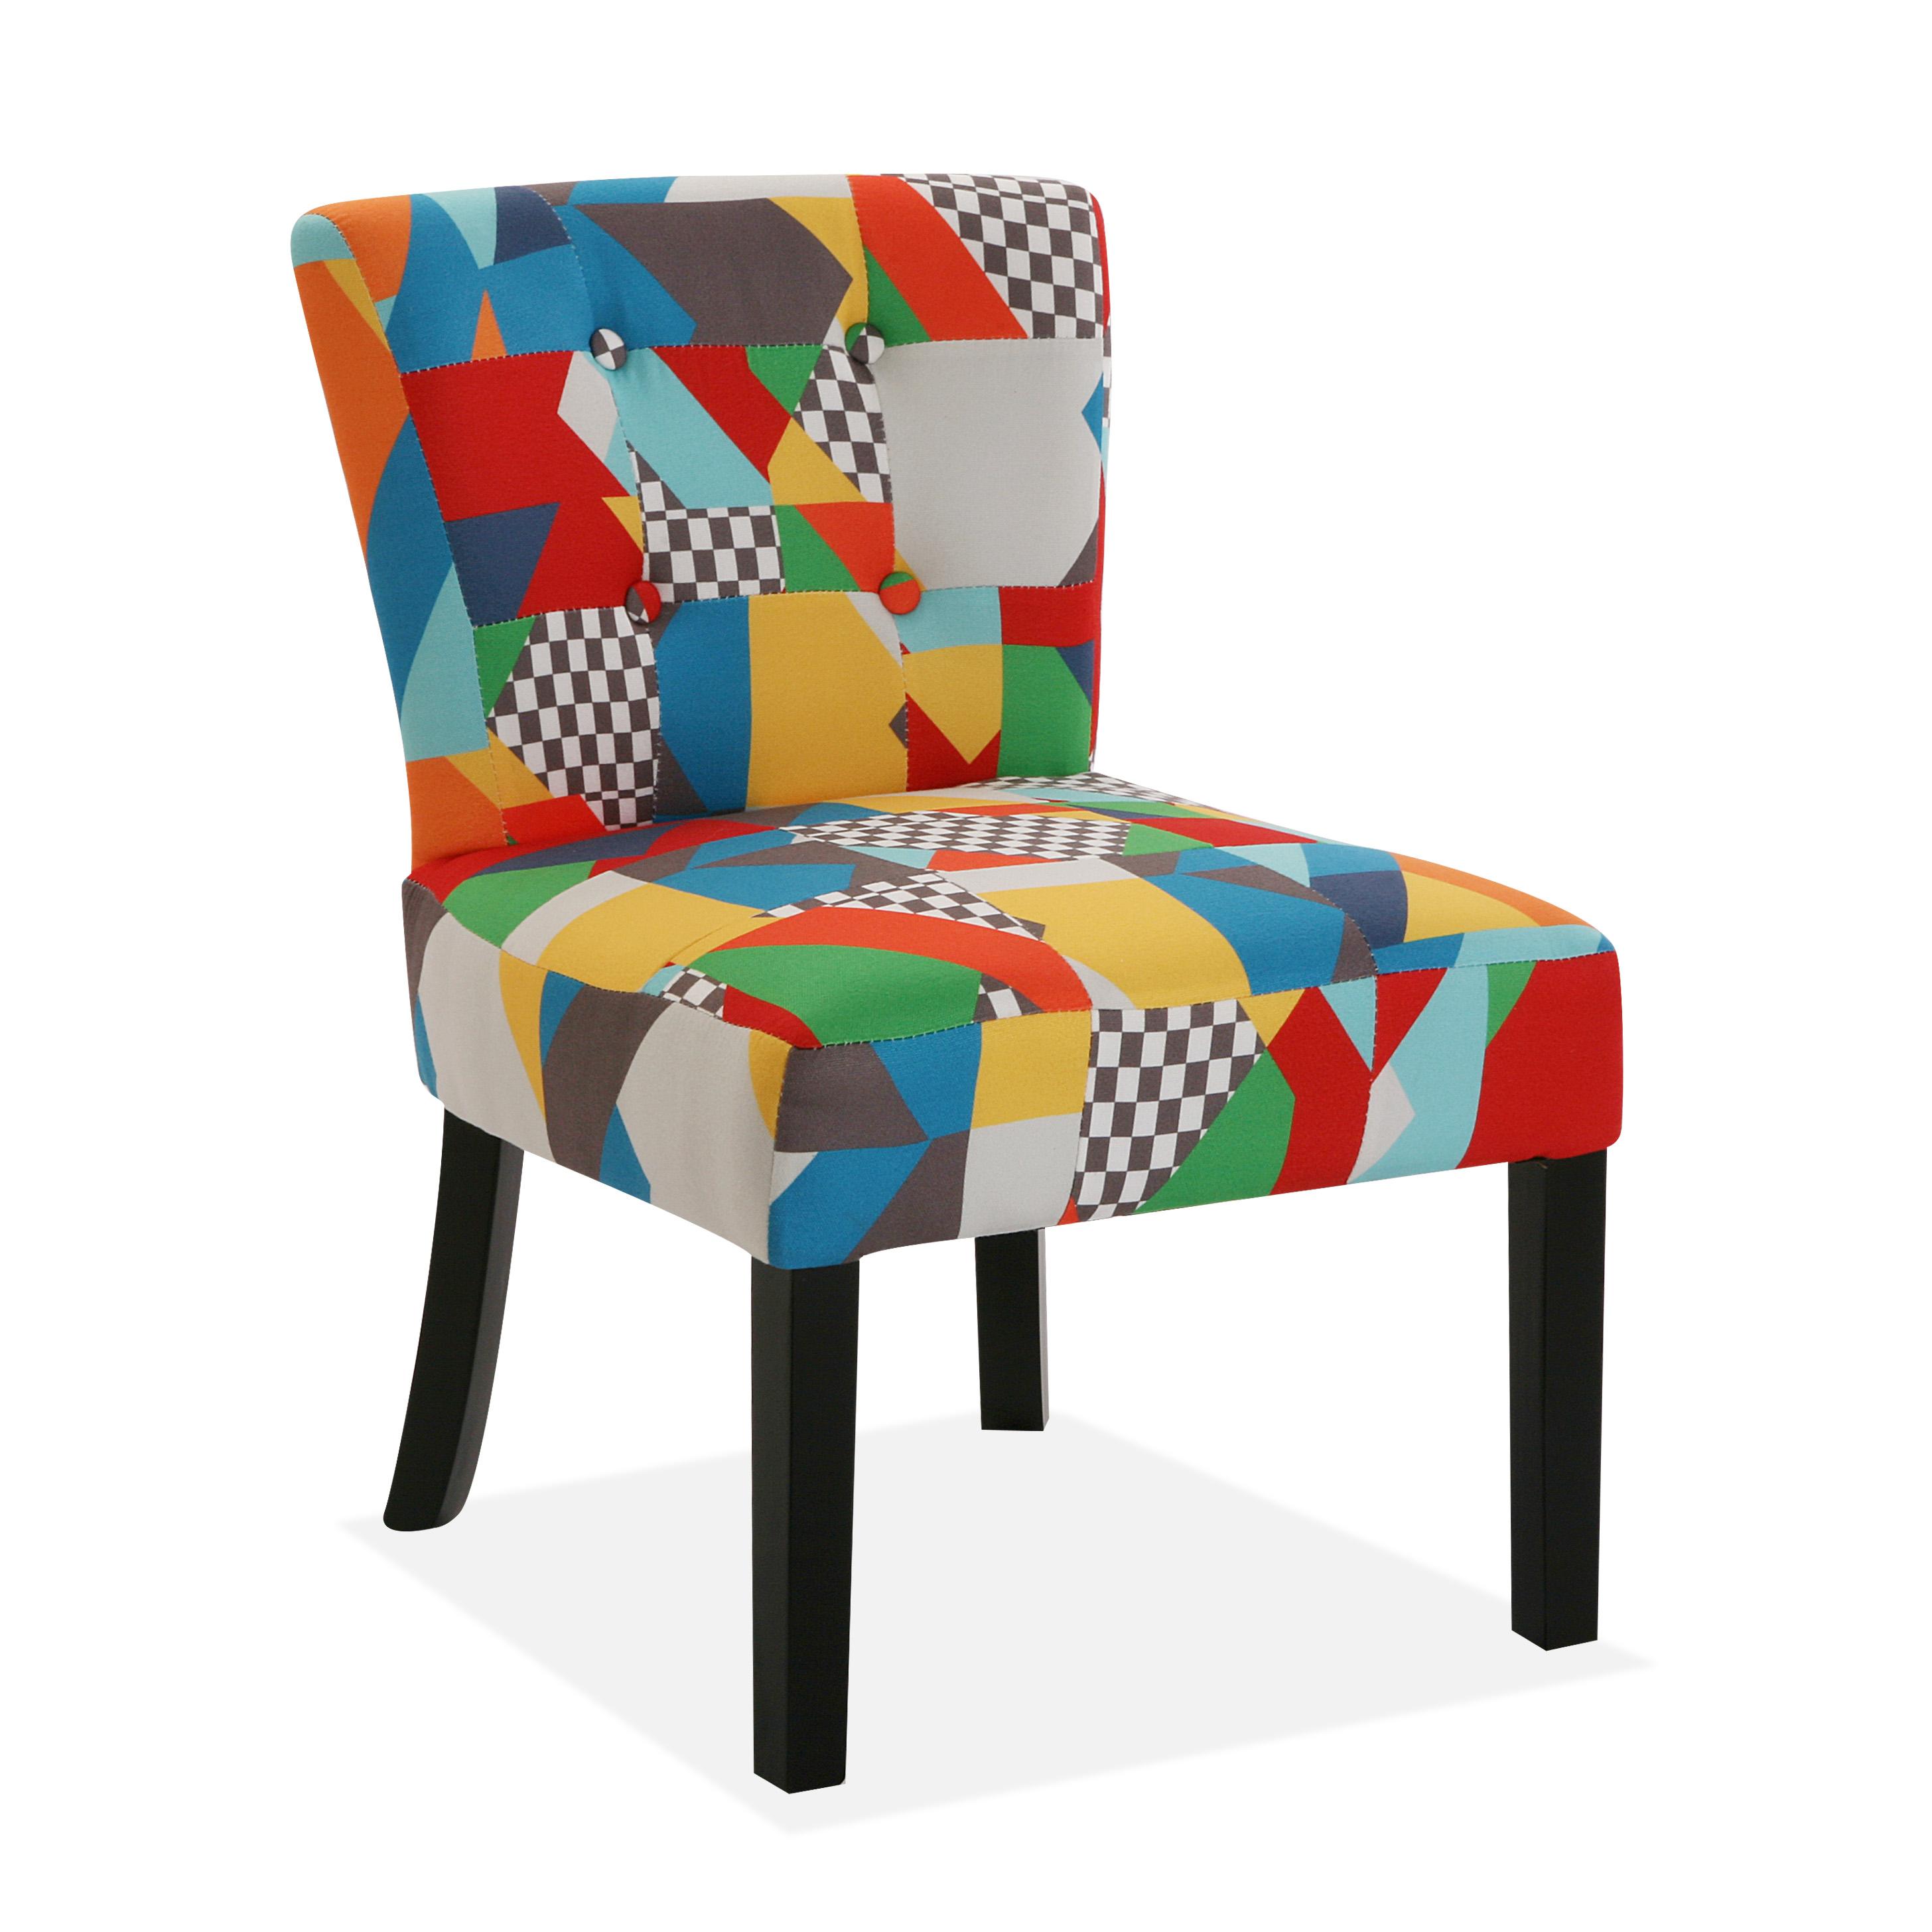 Versa Brais Silla cómoda acolchada y tapizada, 73x64x50cm